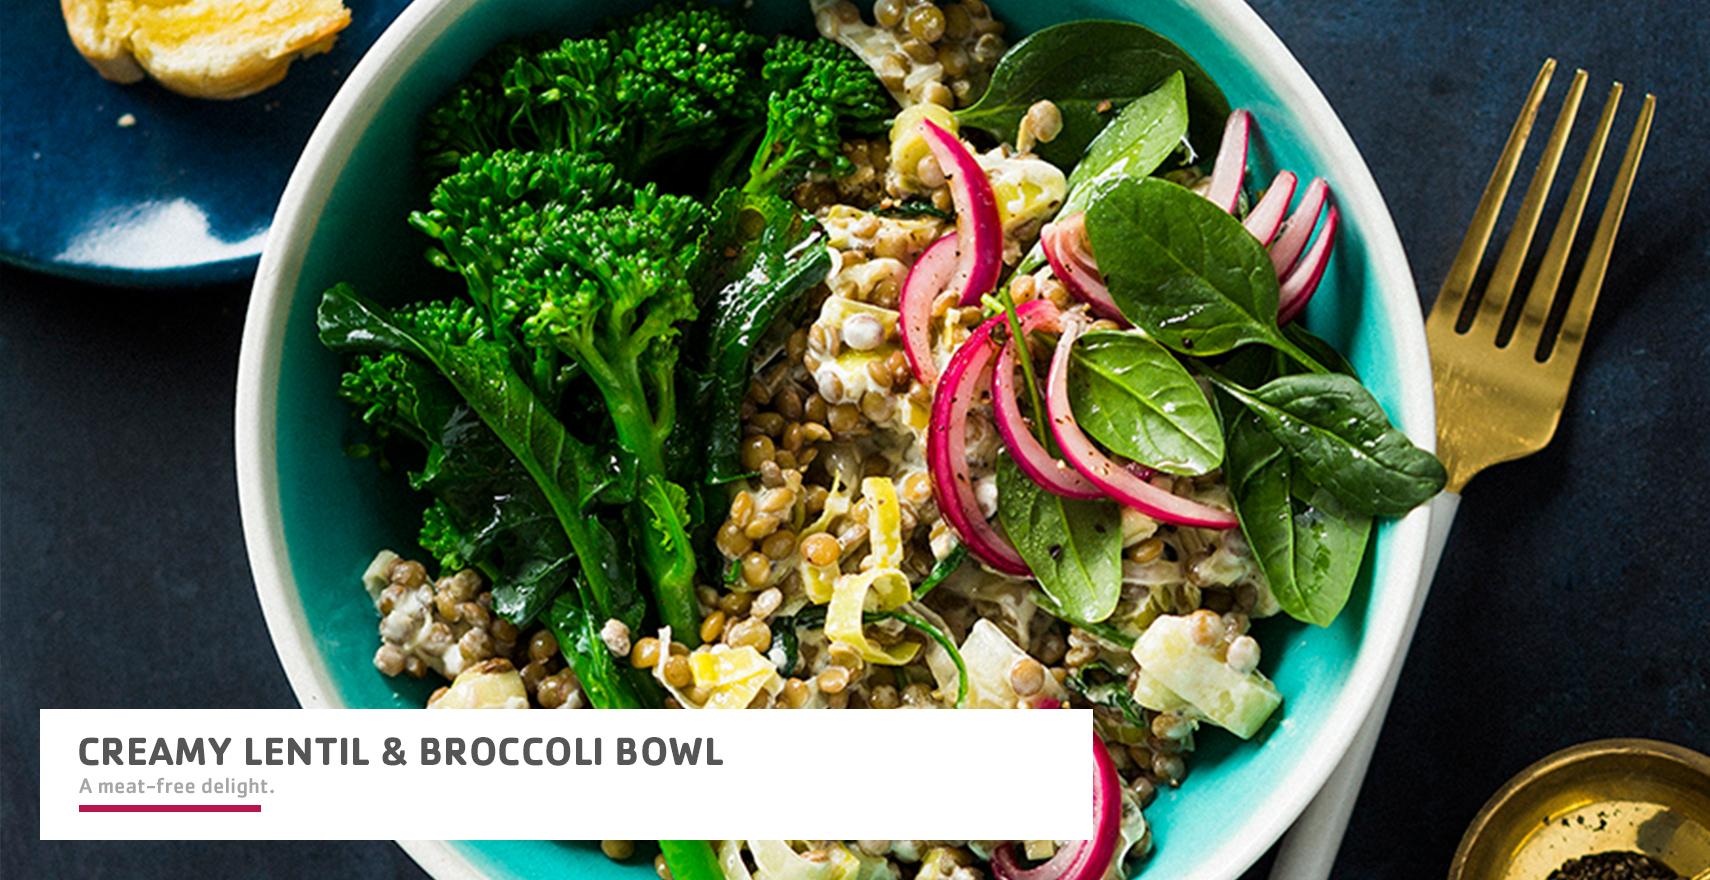 creamy-lentil-and-broccoli-bowl.jpg